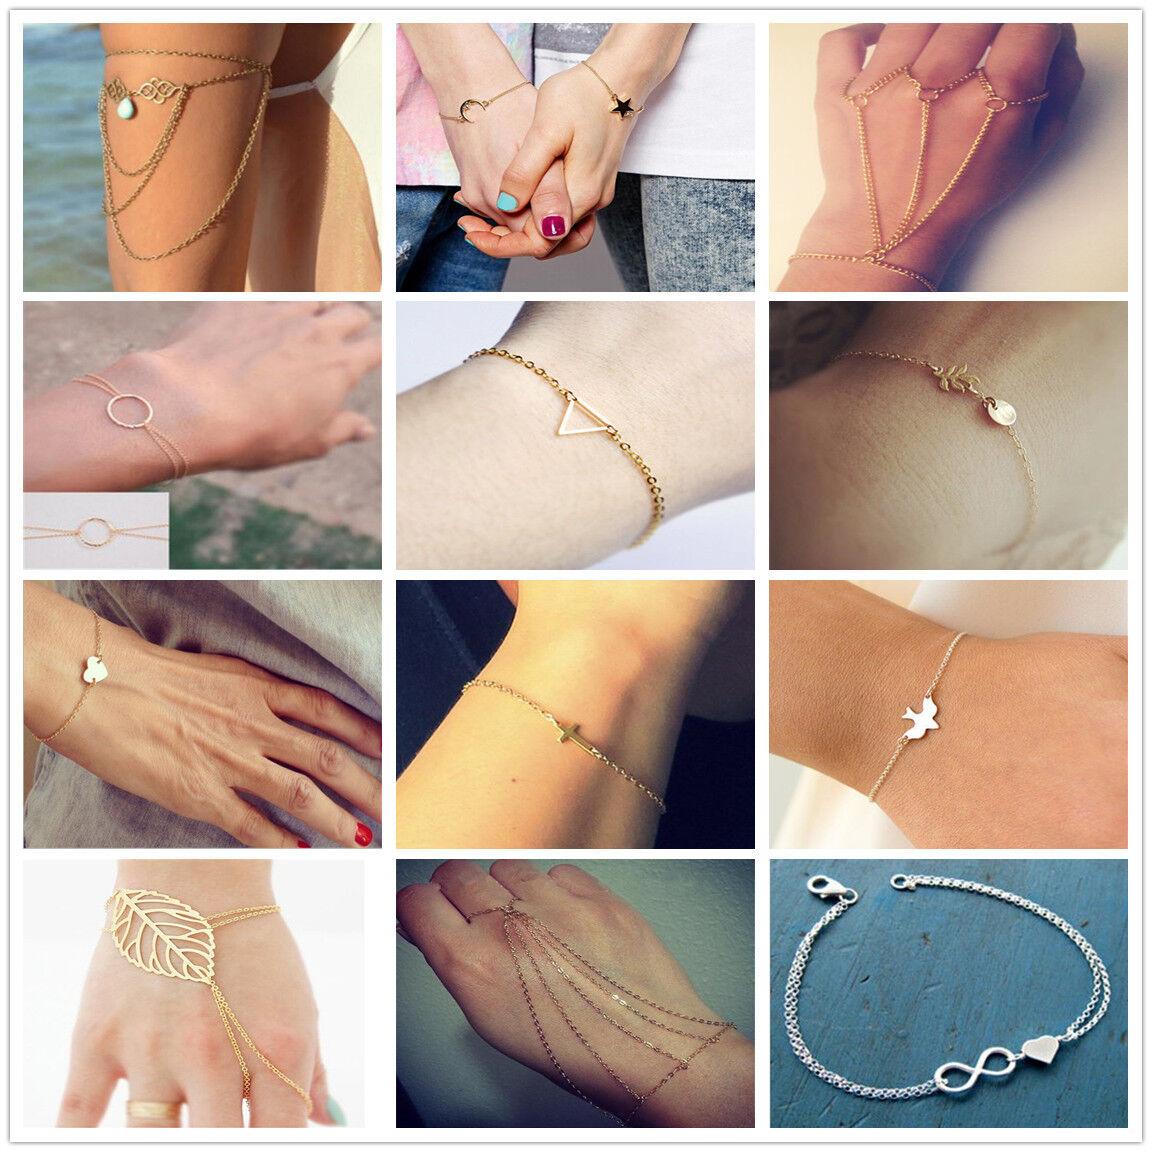 Bracelet - New Fashion Women Gold Plated Punk bracelet Cuff Elegant bracelet Jewelry Gift